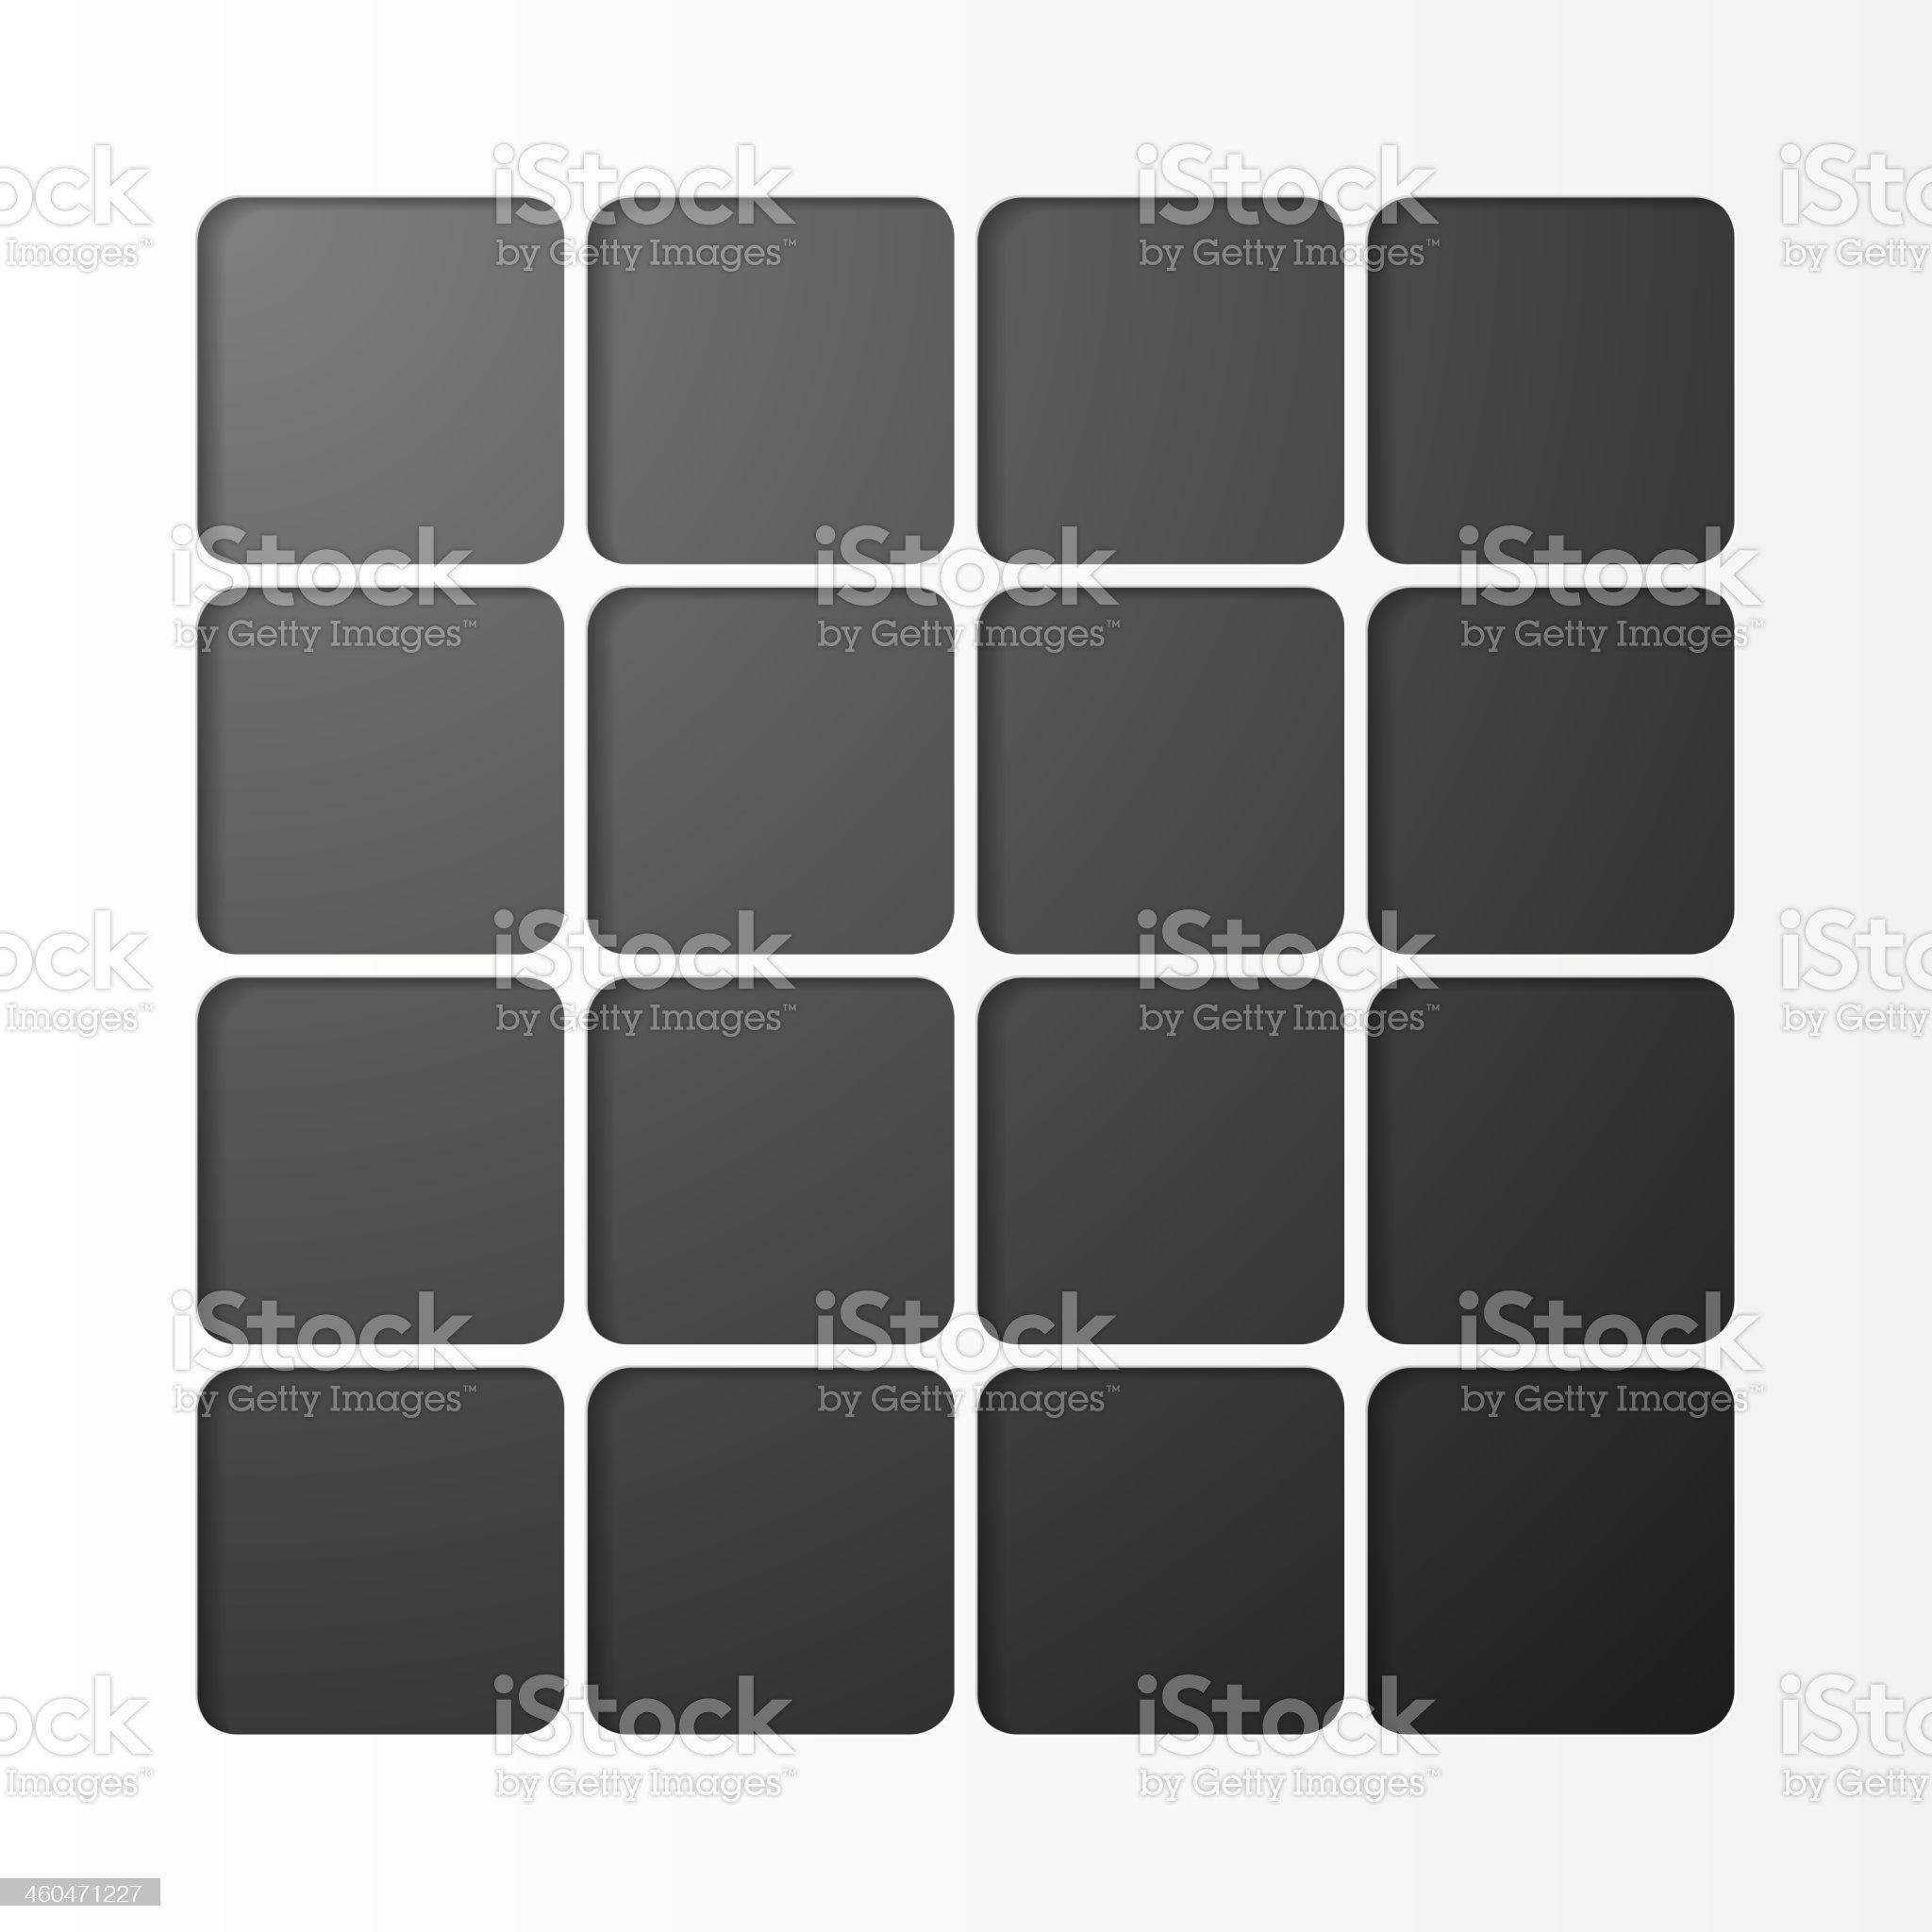 Black squares design royalty-free stock vector art